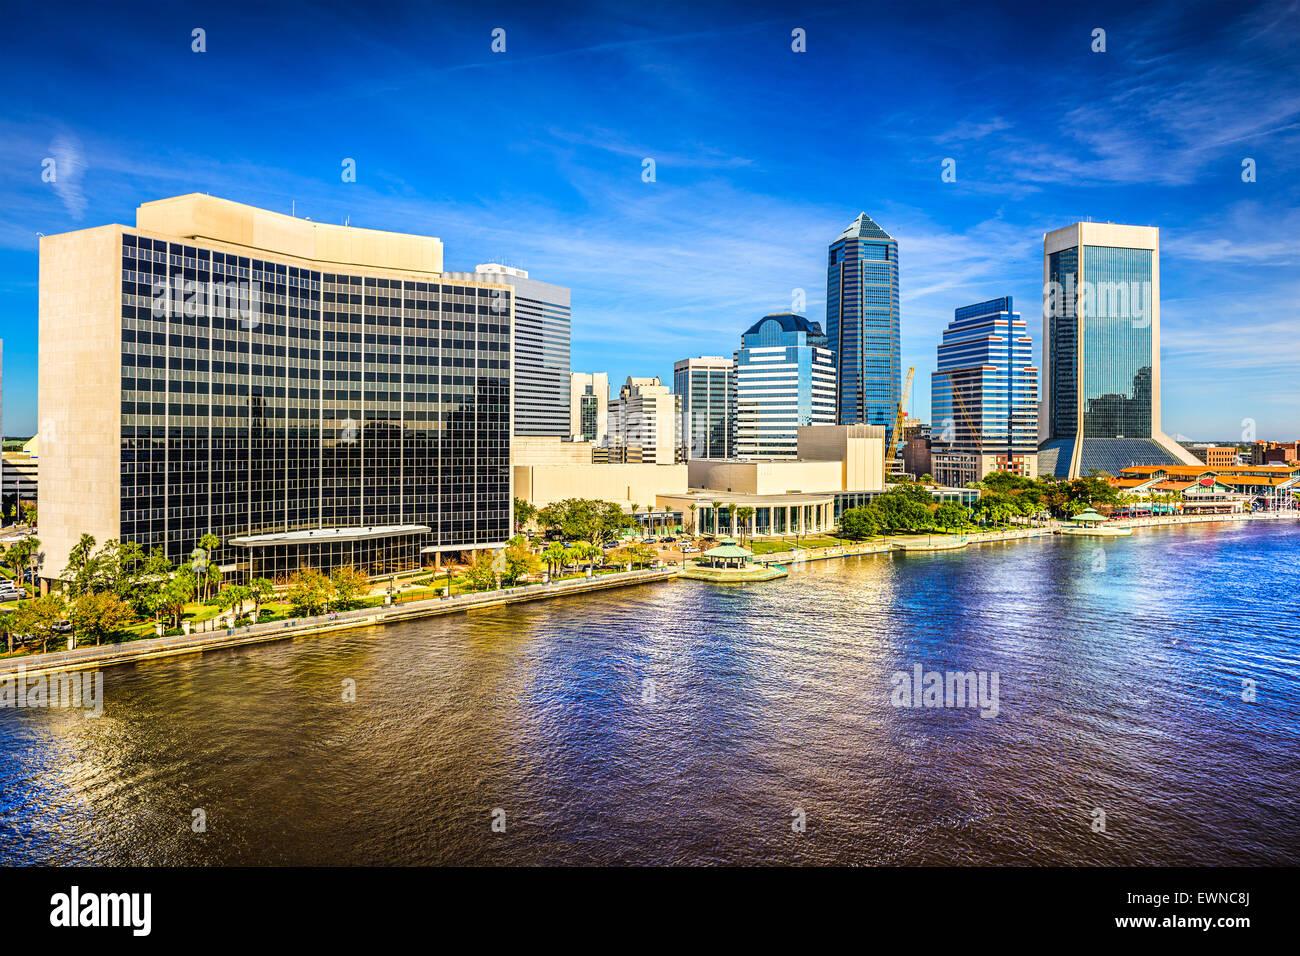 Jacksonville, Florida, USA downtown city skyline on St. Johns River. - Stock Image